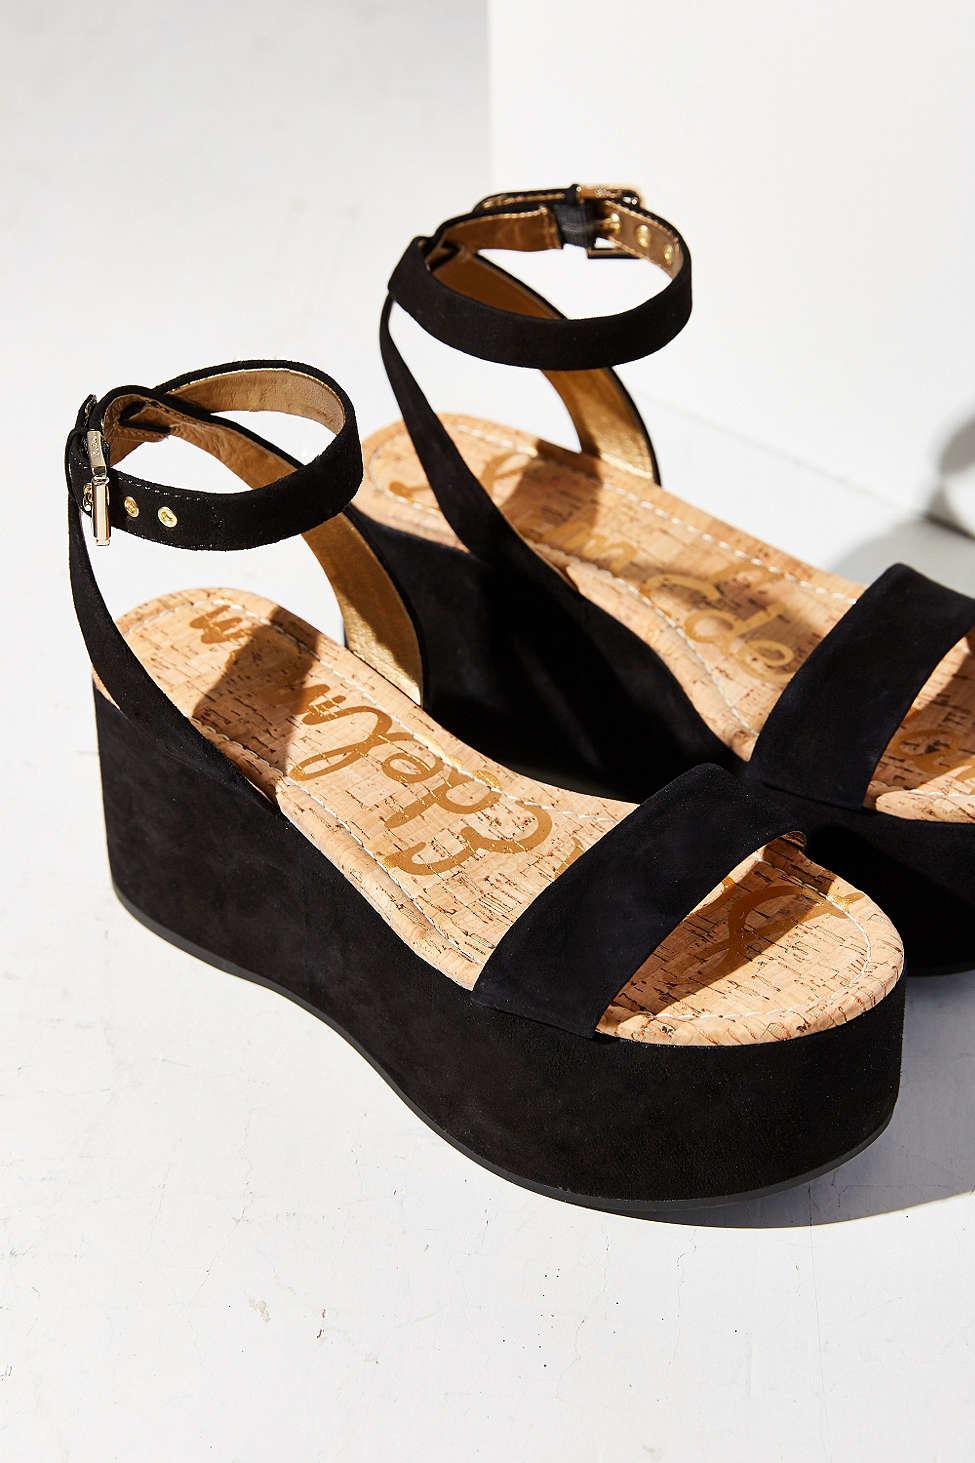 b16972a0254 Lyst - Sam Edelman Henley Platform Sandal in Black